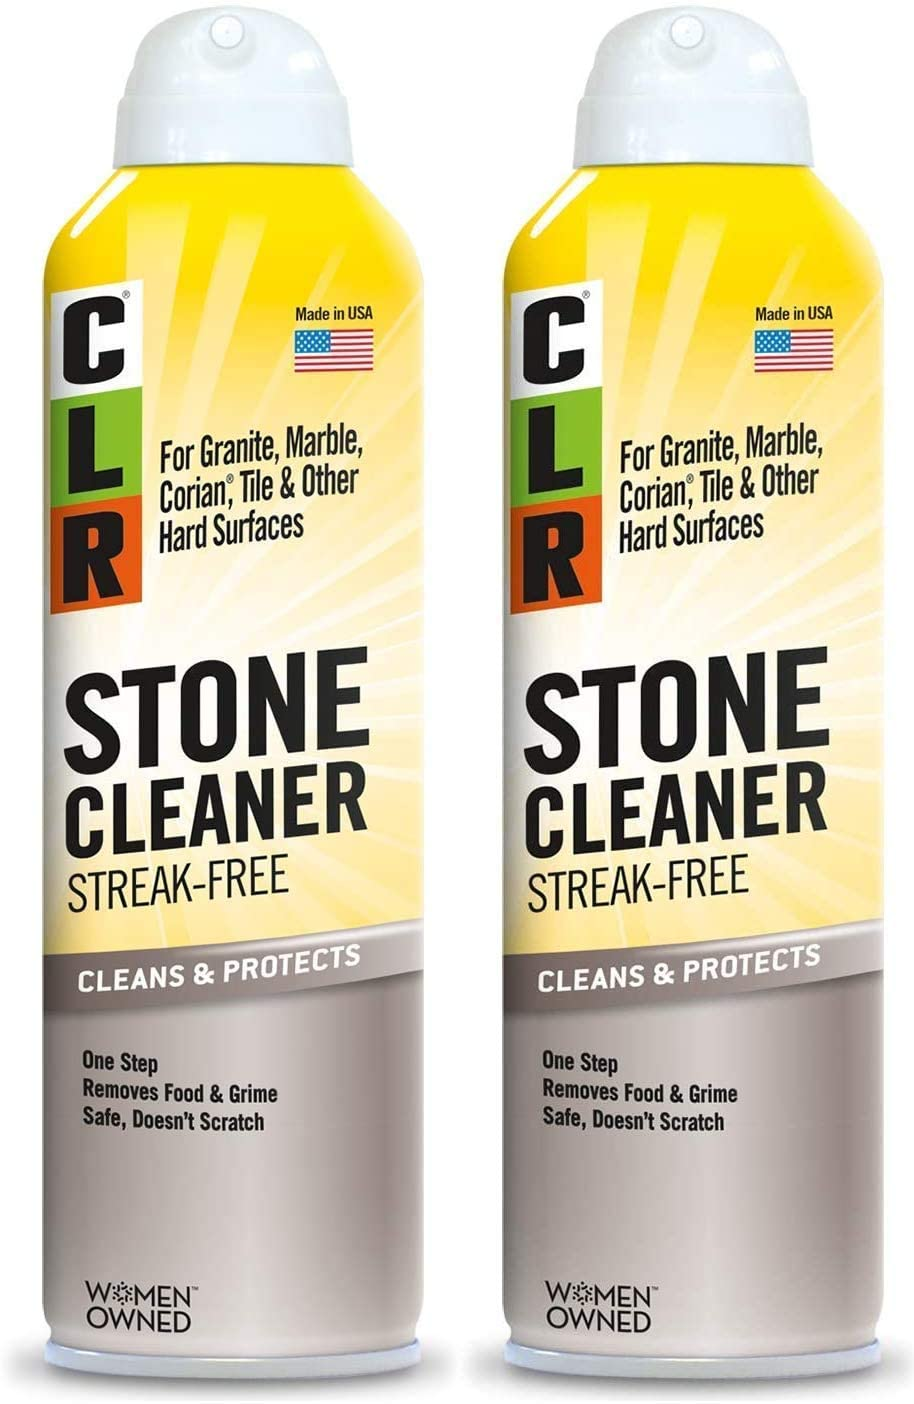 CLR Stone Cleaner Streak-Free 12 Packagin All items free 1 year warranty shipping Aerosol Ounce Spray